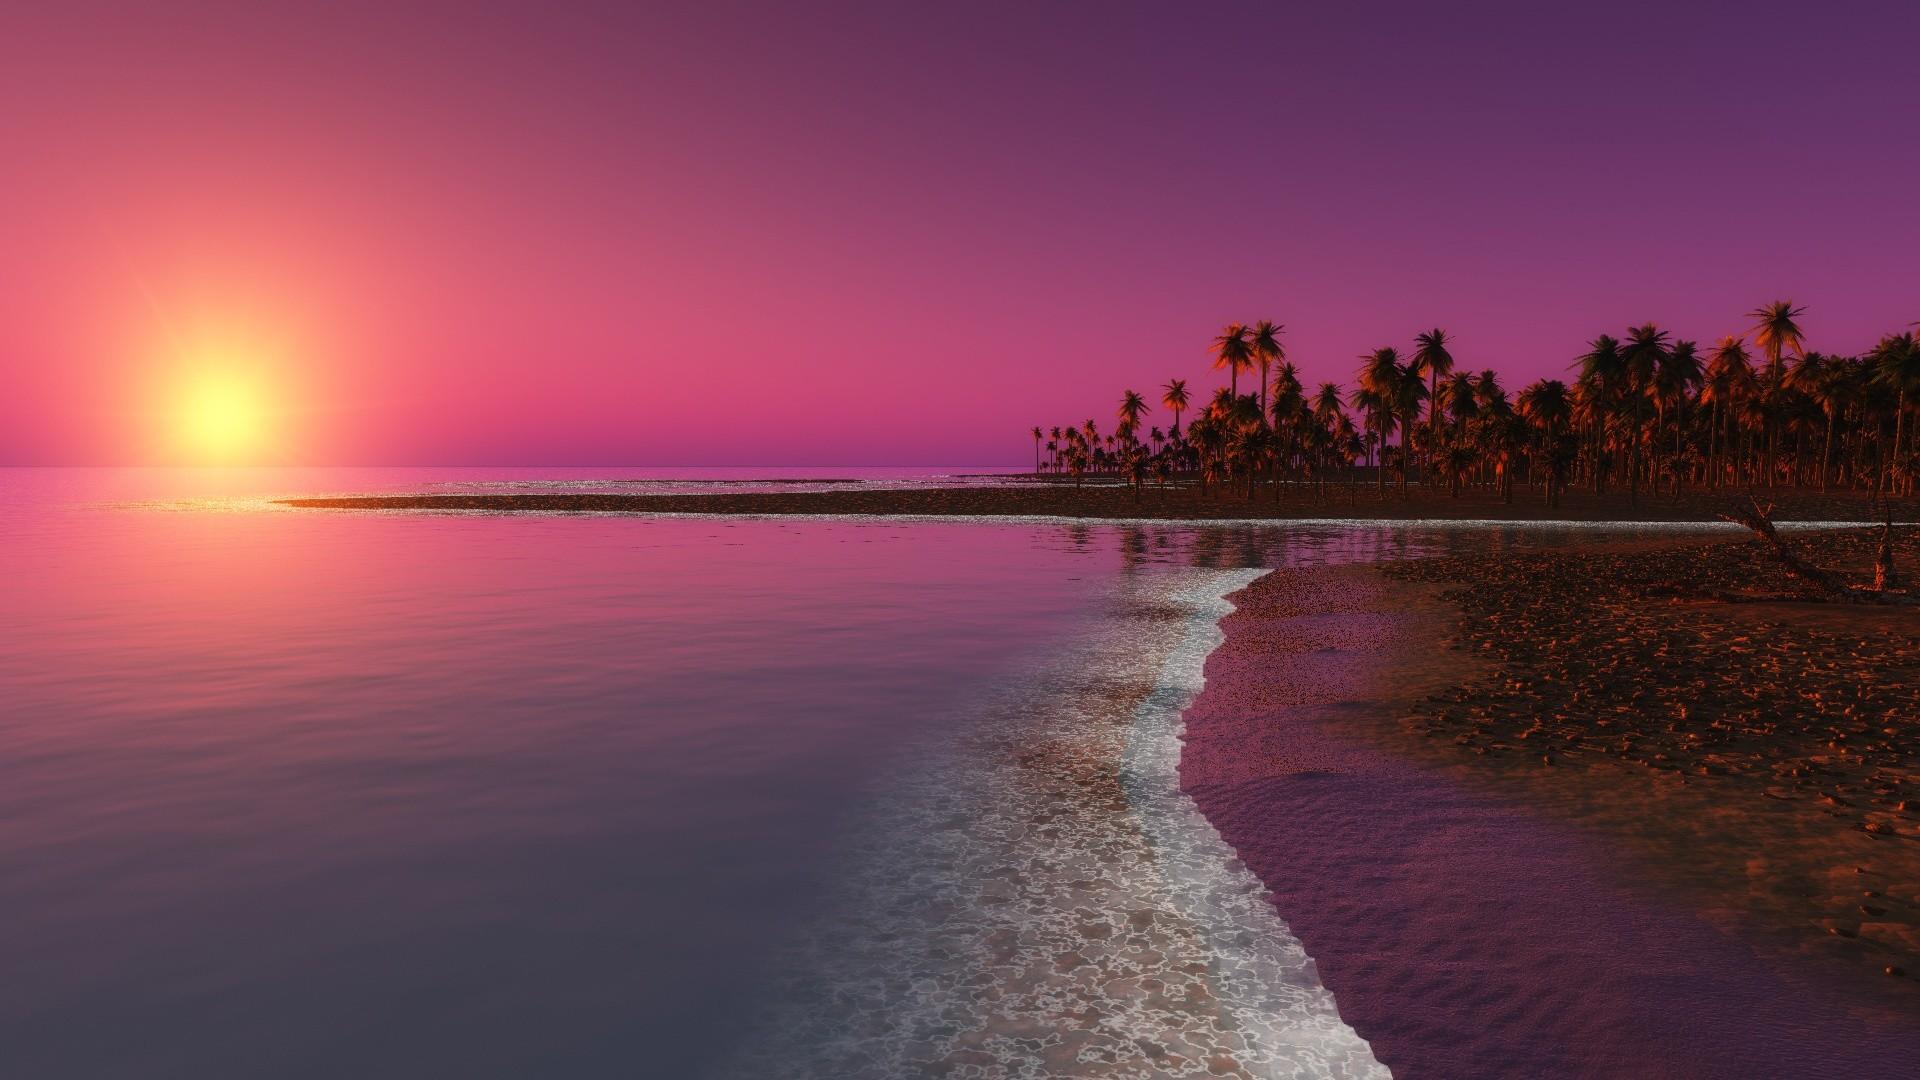 Sunset Wallpaper For Desktop 57 Pictures